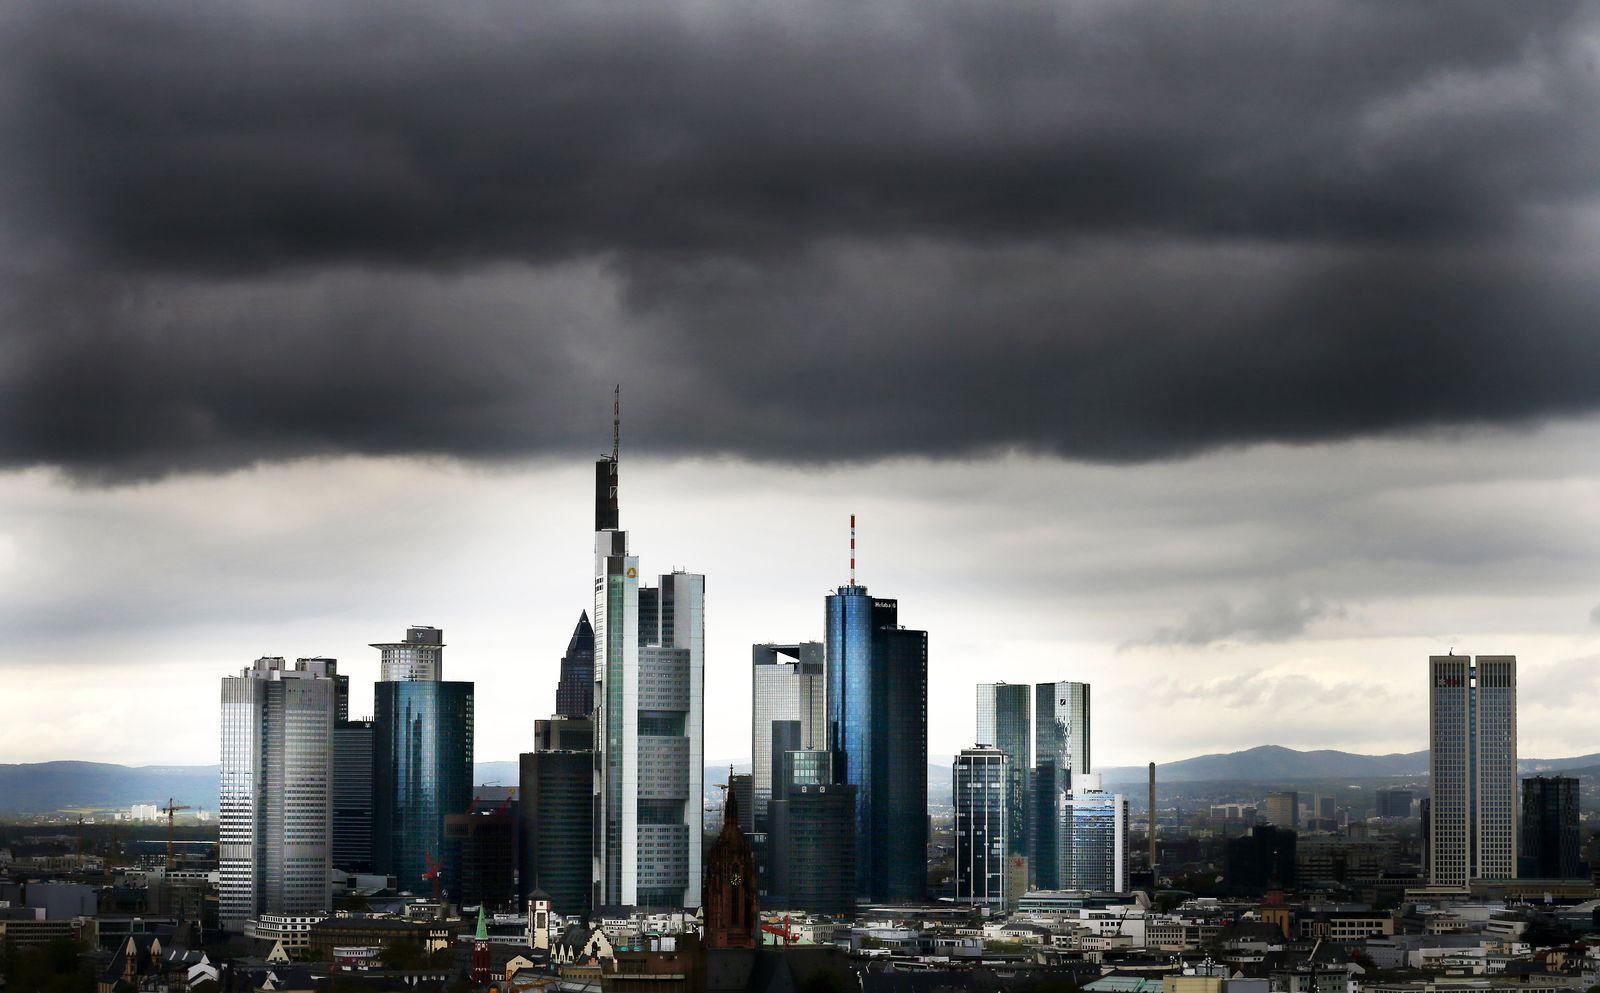 Frankfurt / Banken-Viertel / Banken / Skyline